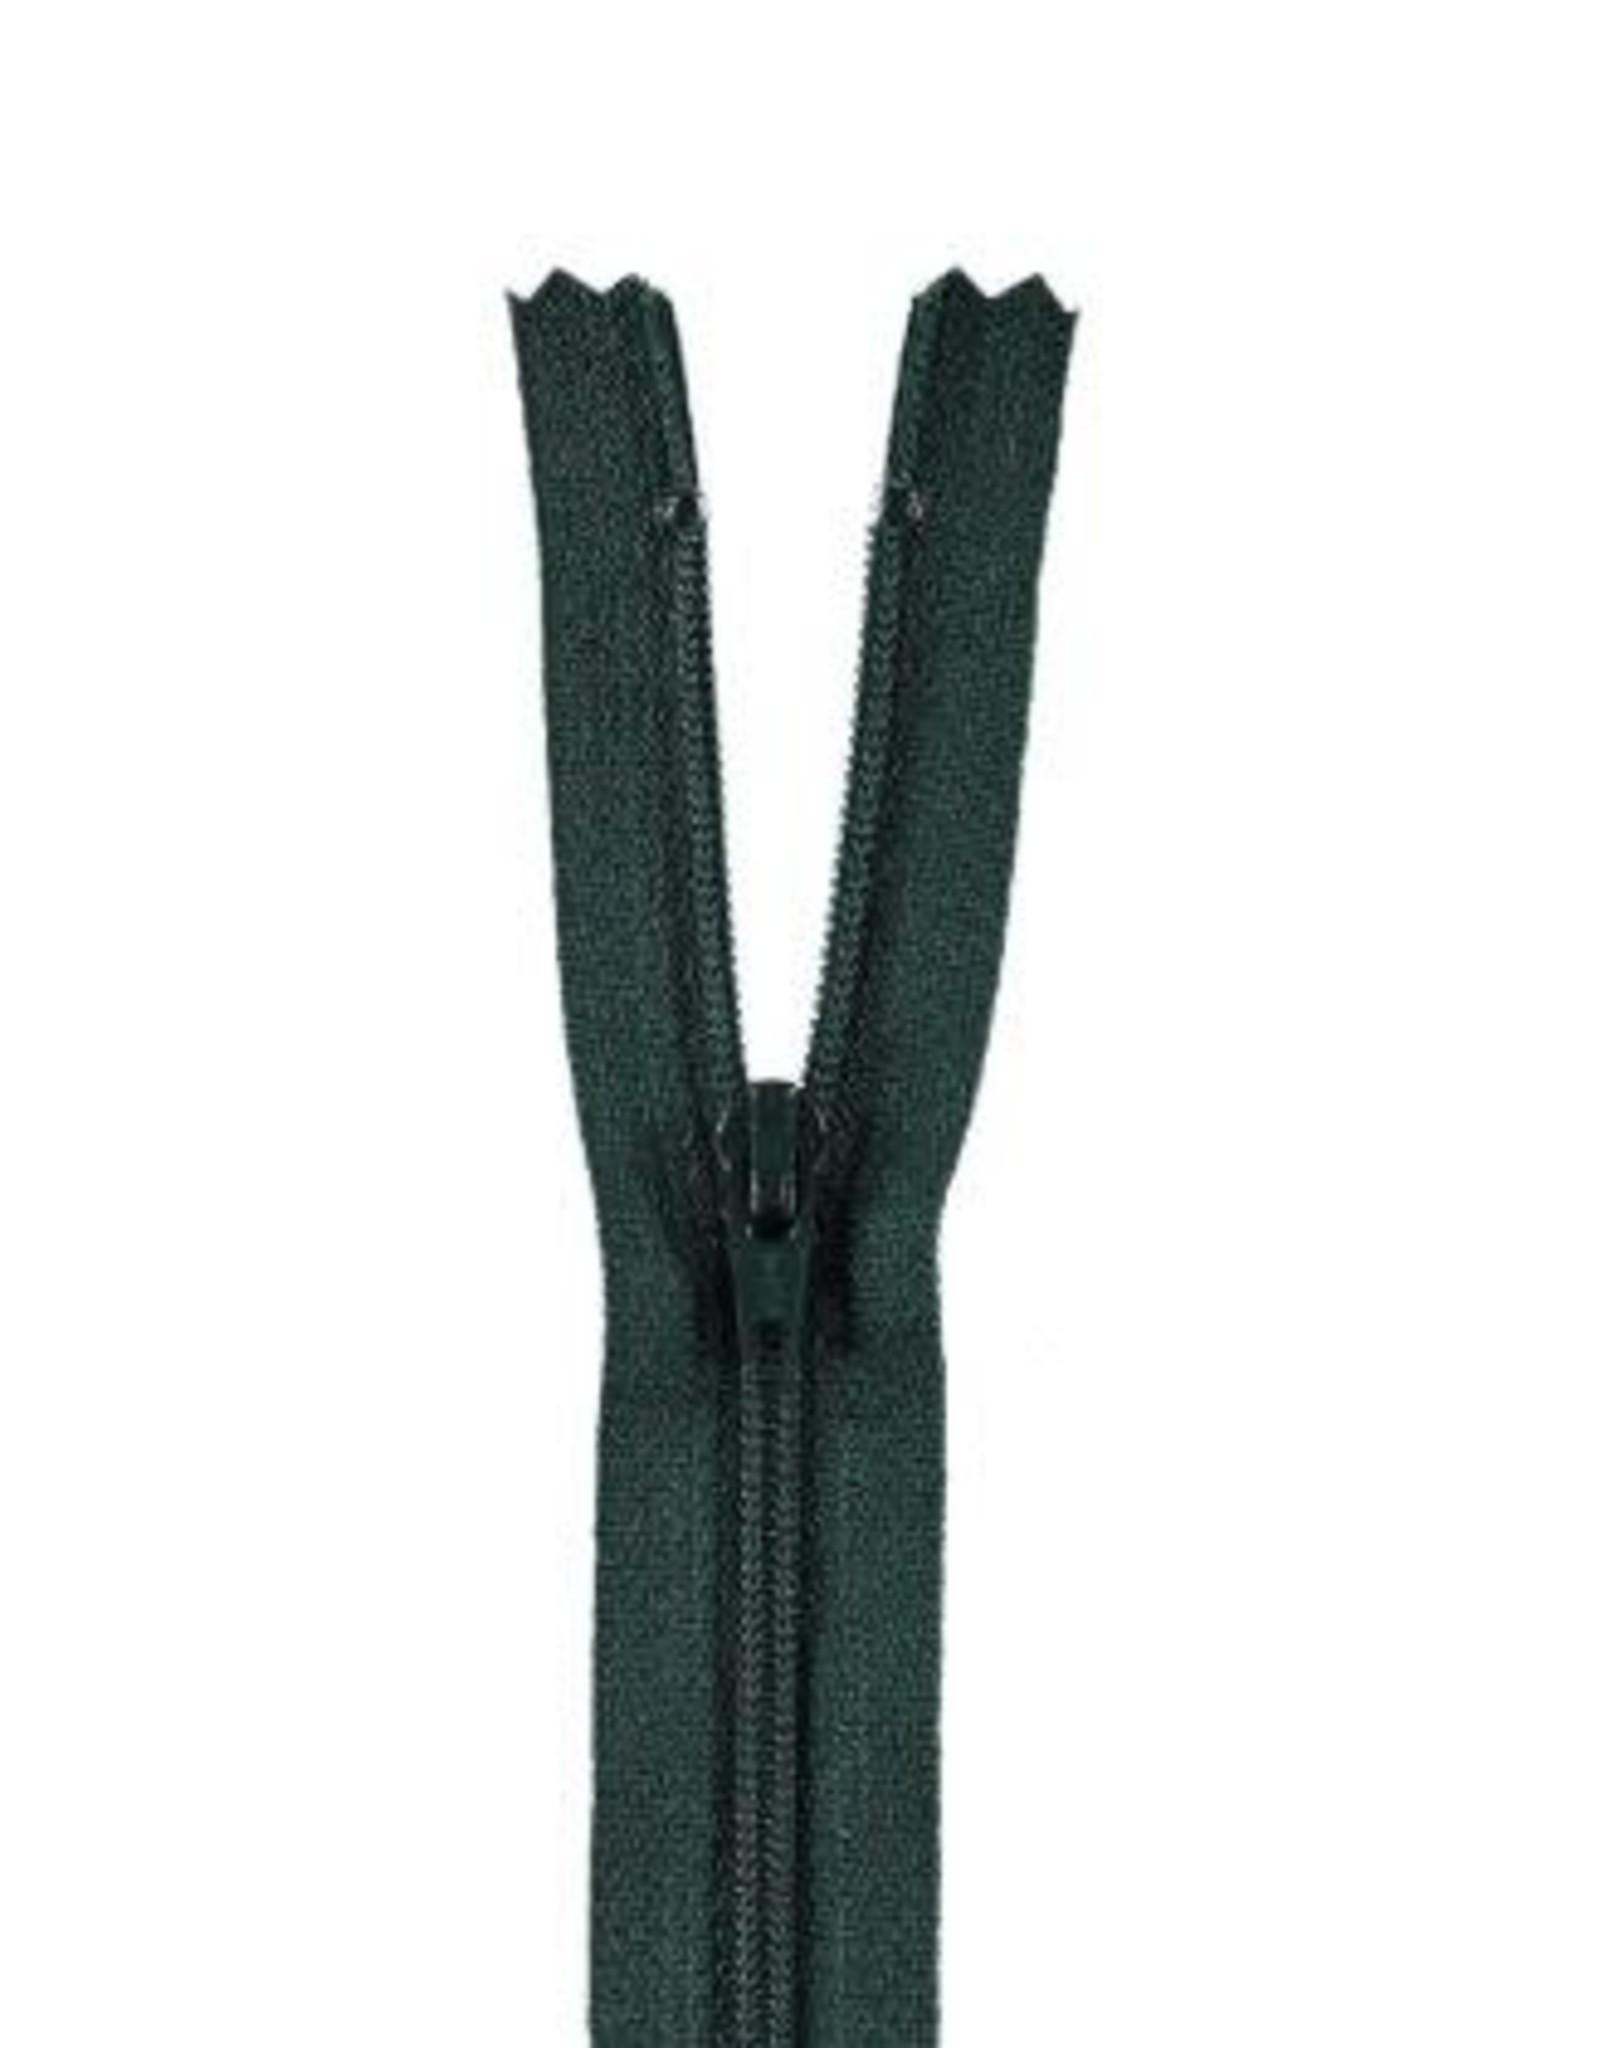 YKK Spiraalrits niet-DB 3mm donker groen 890-18cm